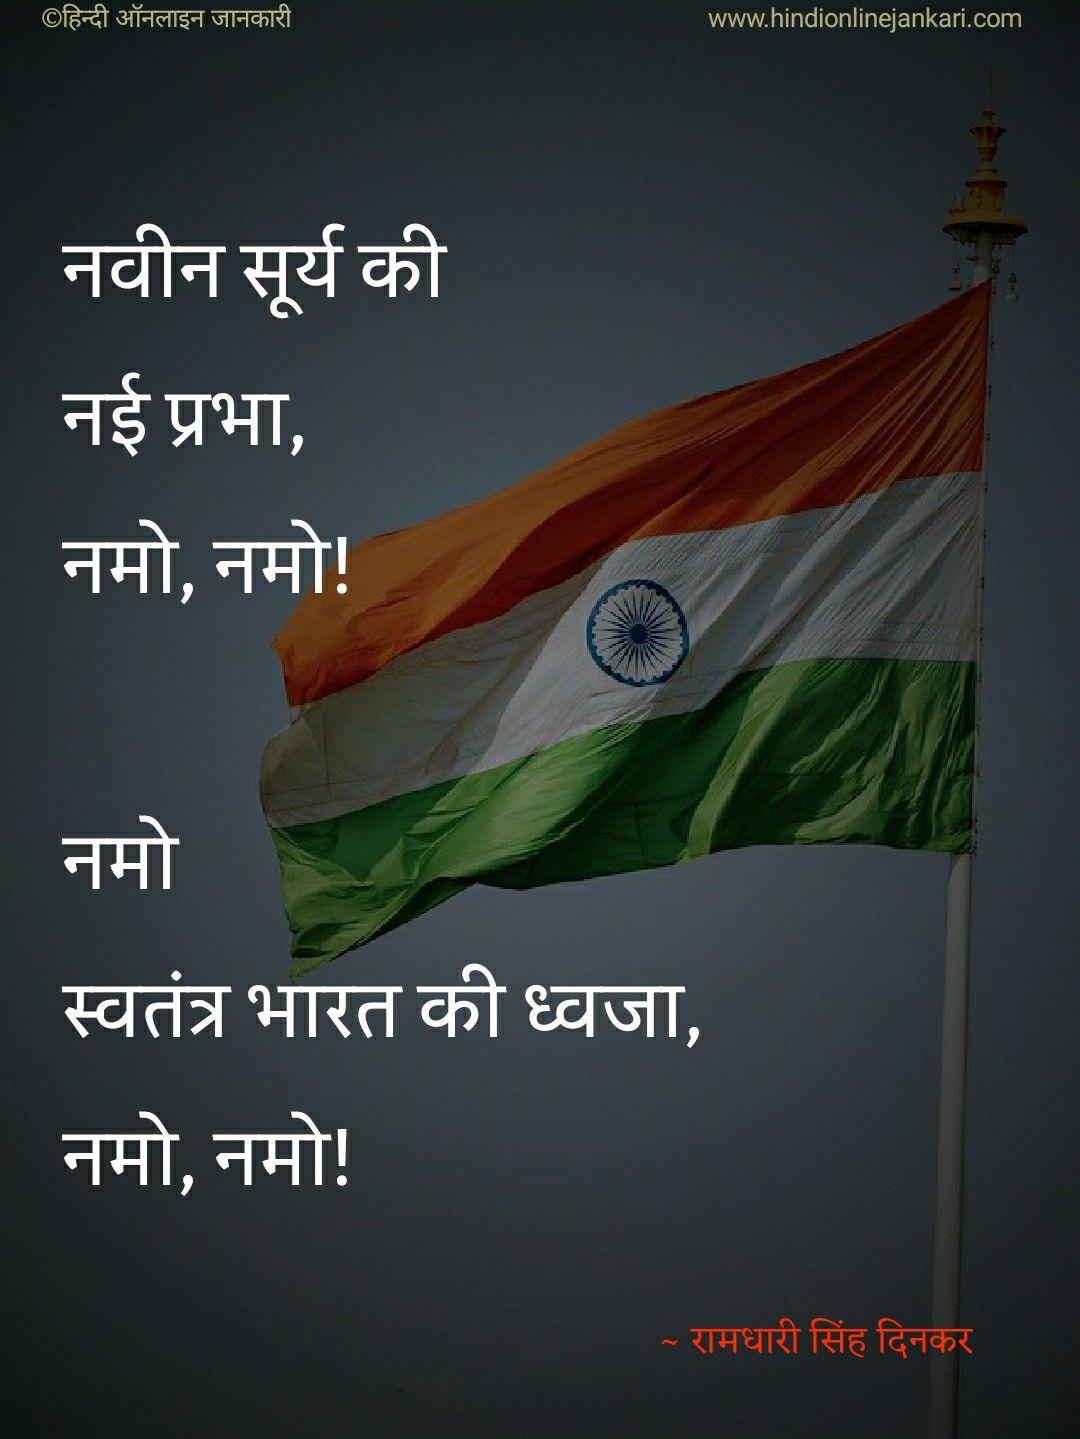 Ramdhari Singh Dinkar Poems In Hindi Ramdhari Singh Dinkar Poems Ramdhari Singh Dinkar Indian Army Quotes